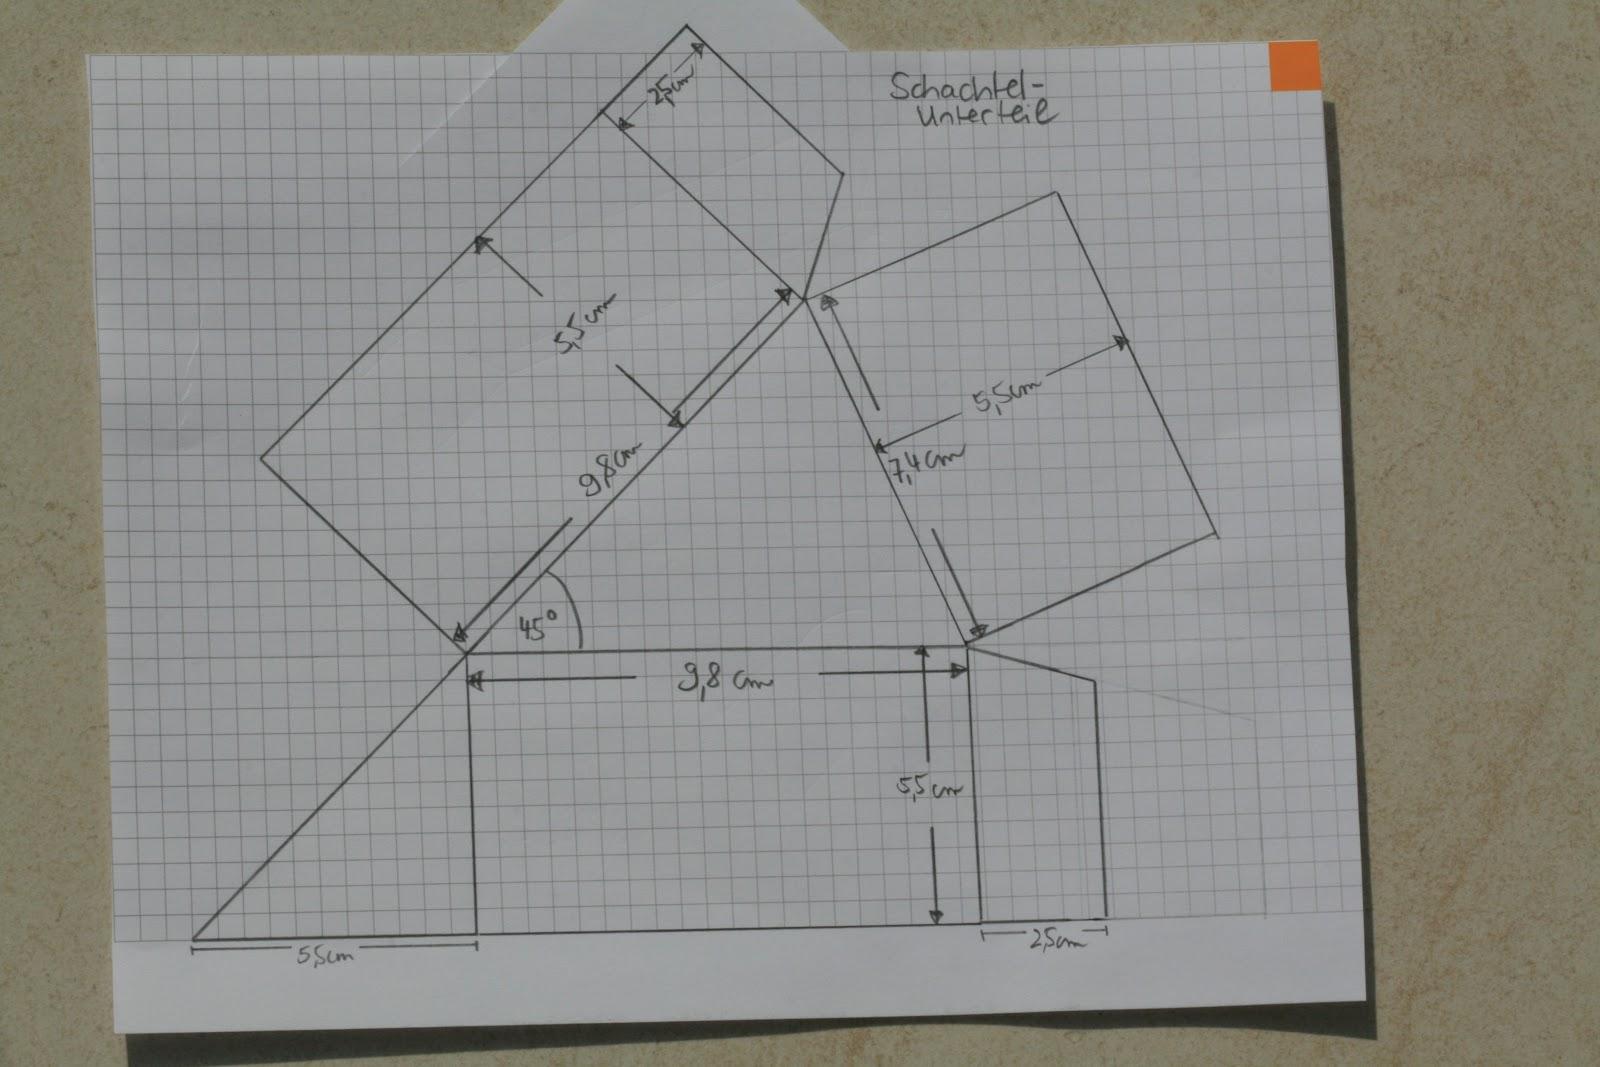 geburtstagstorte basteln papier my blog. Black Bedroom Furniture Sets. Home Design Ideas